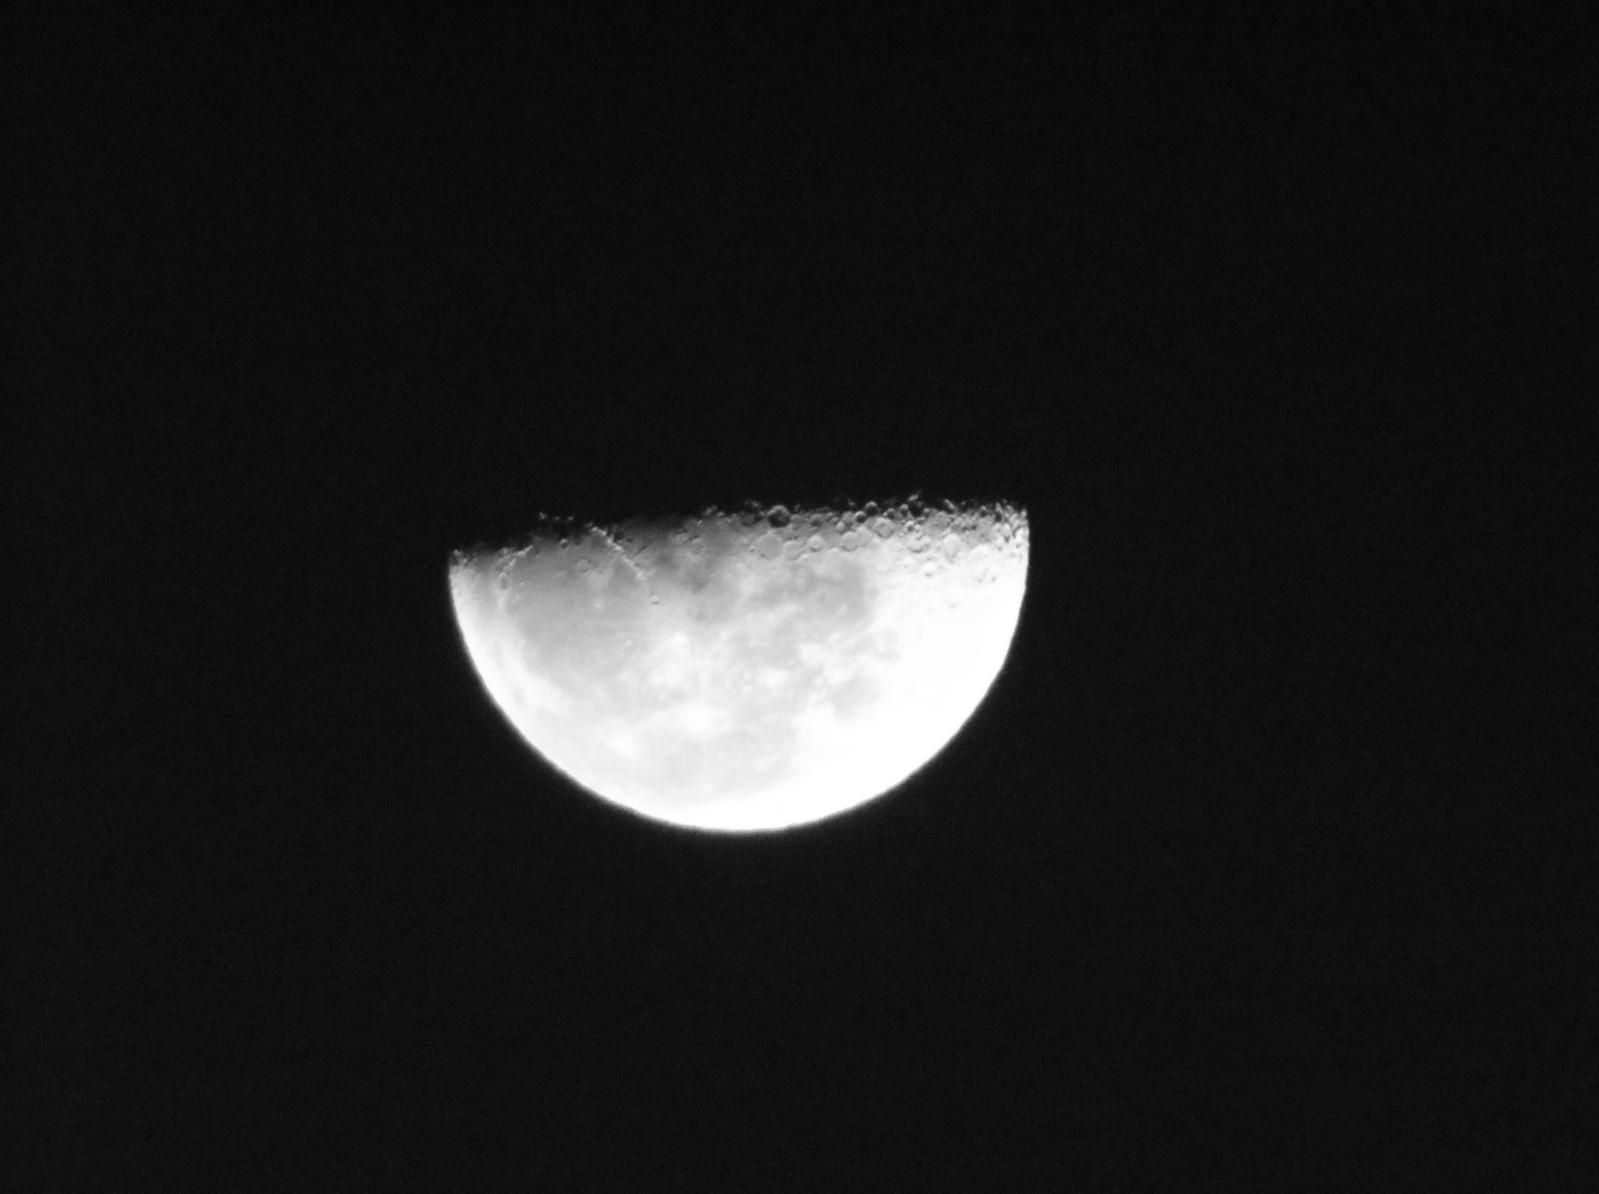 Fotos da Lua - Câmera compacta + Binóculo 10x50 2upvc3s